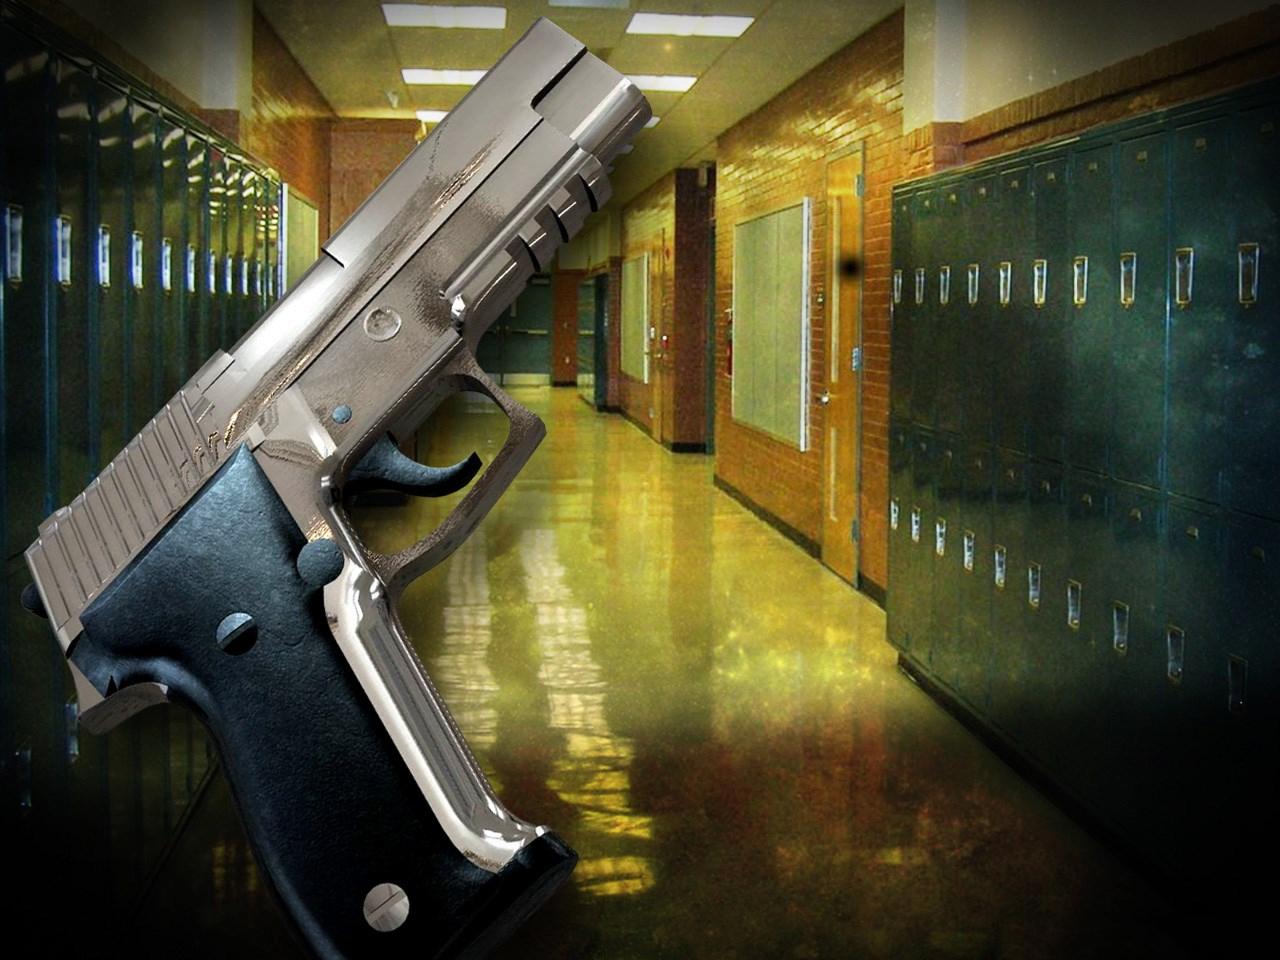 gun in school_1558124164907.jpg.jpg